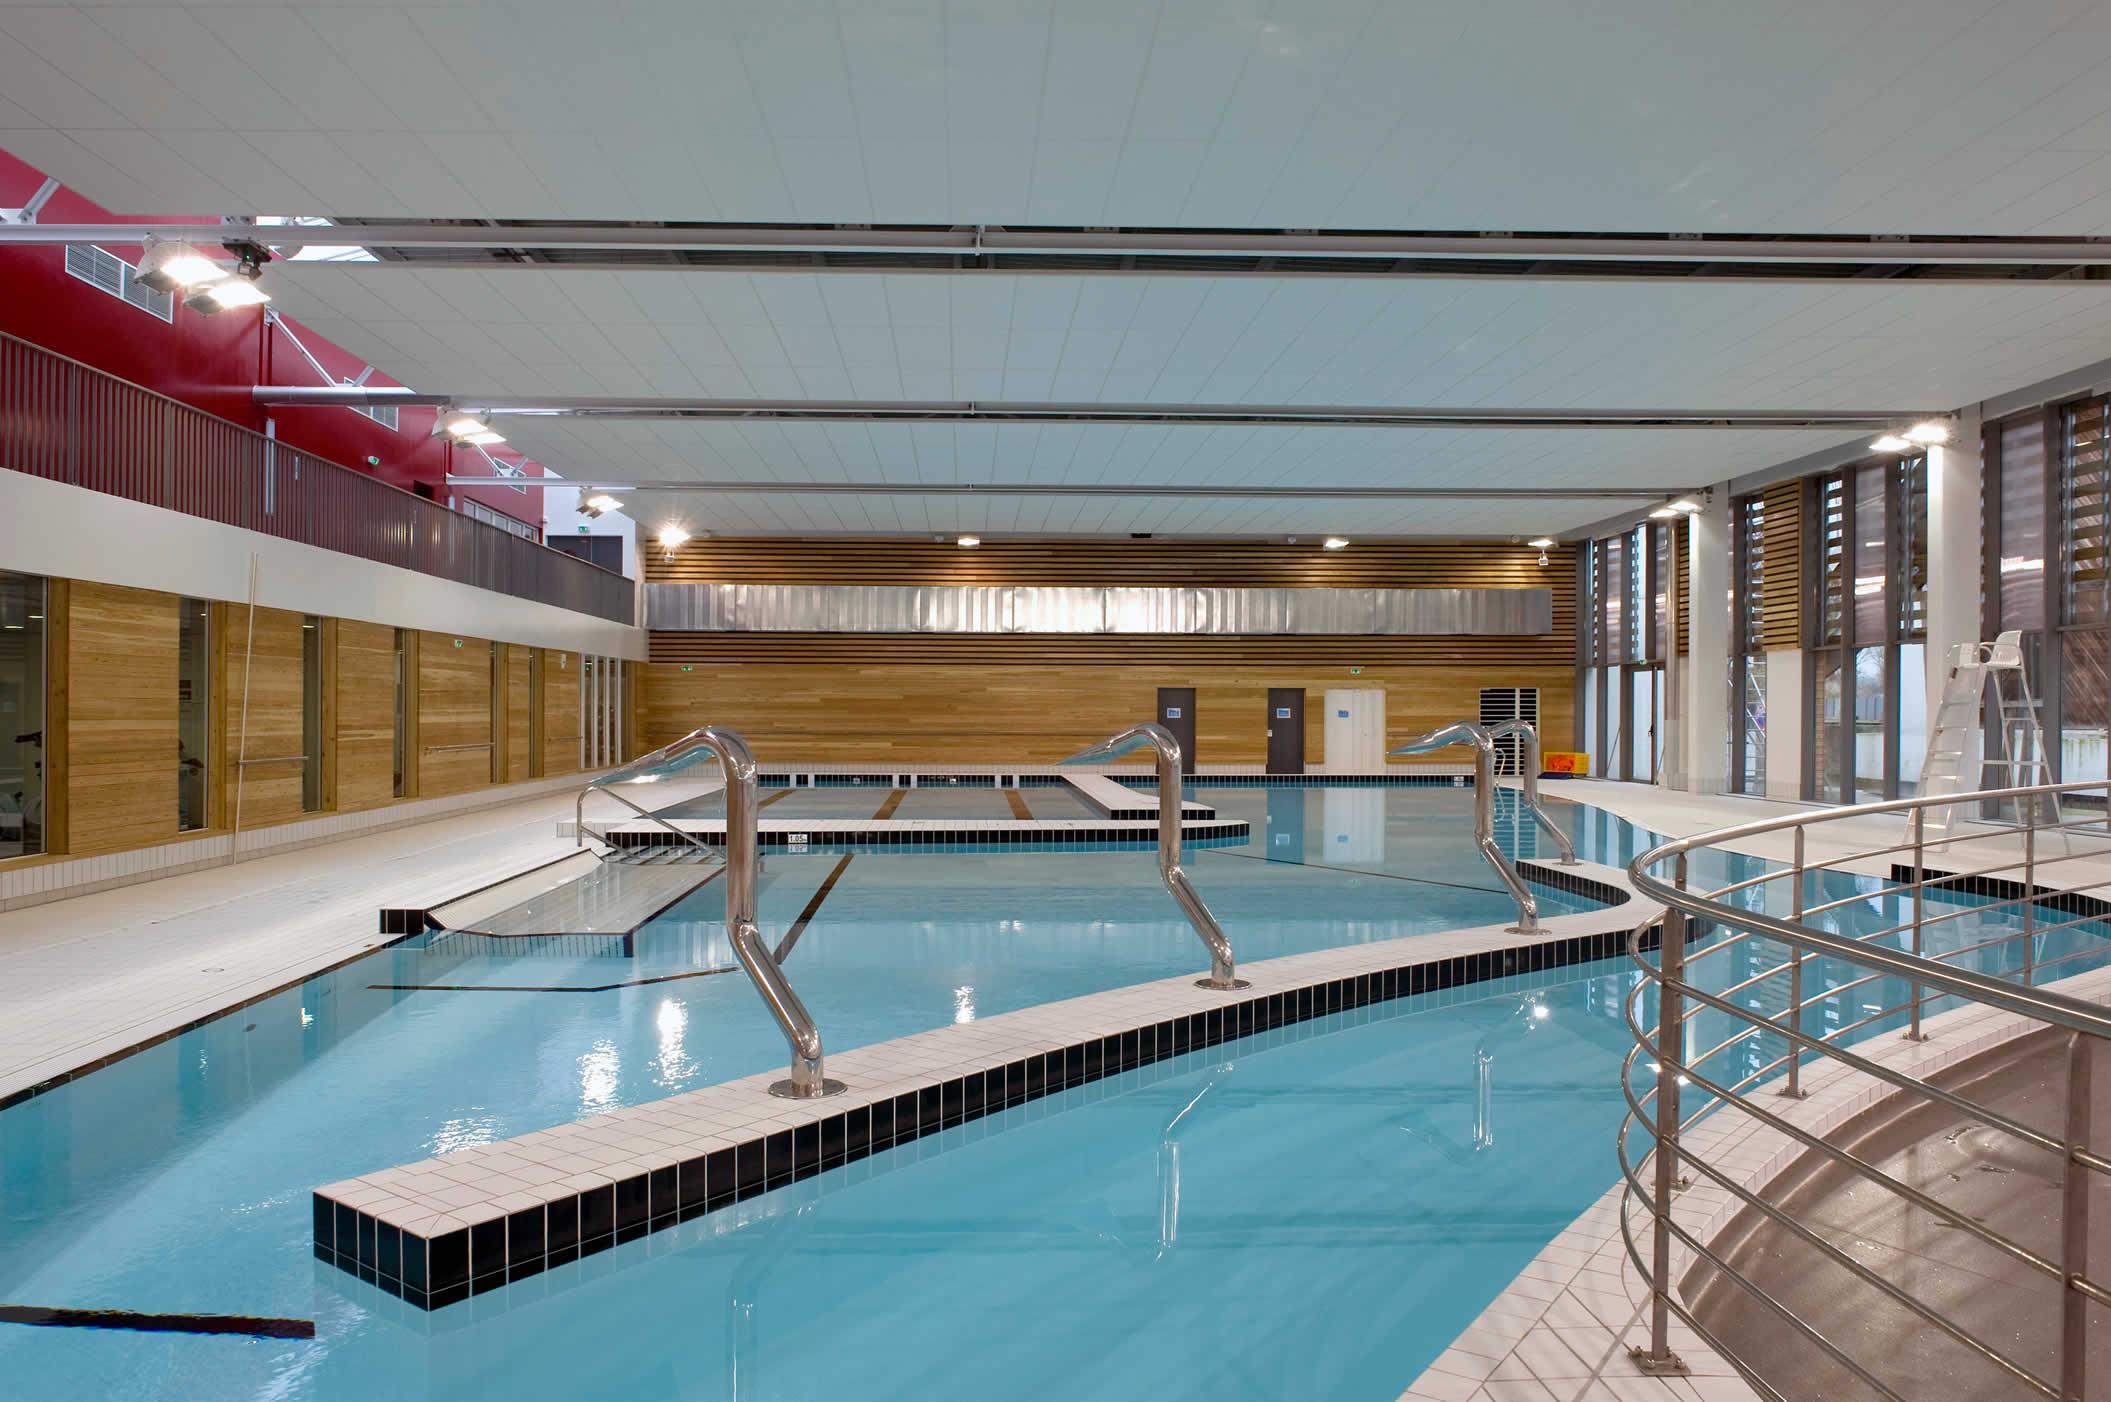 Centre aquatique du pays sedanais - AMA Architectes